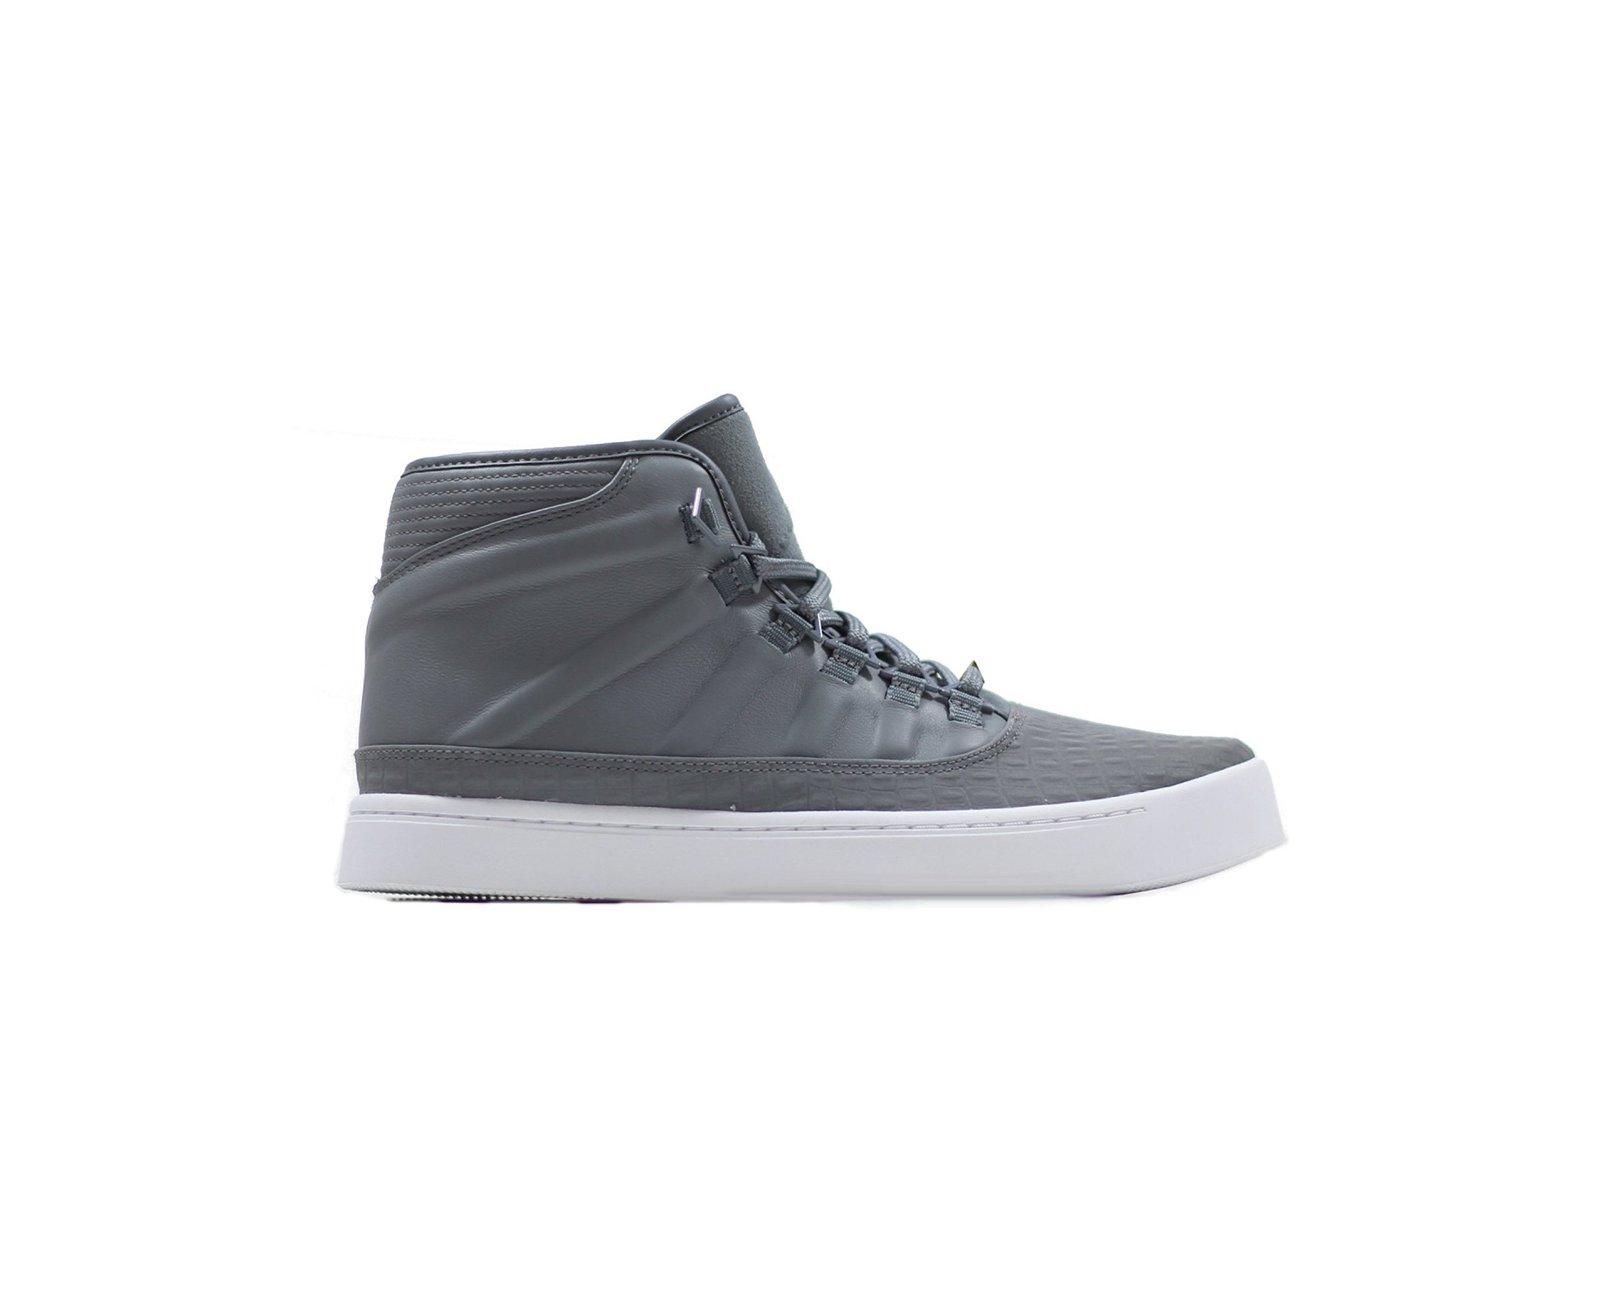 new style 42ce6 51fcc nike air jordan westbrook 0 mens hi top trainers 768934 sneakers shoes (uk 7 .